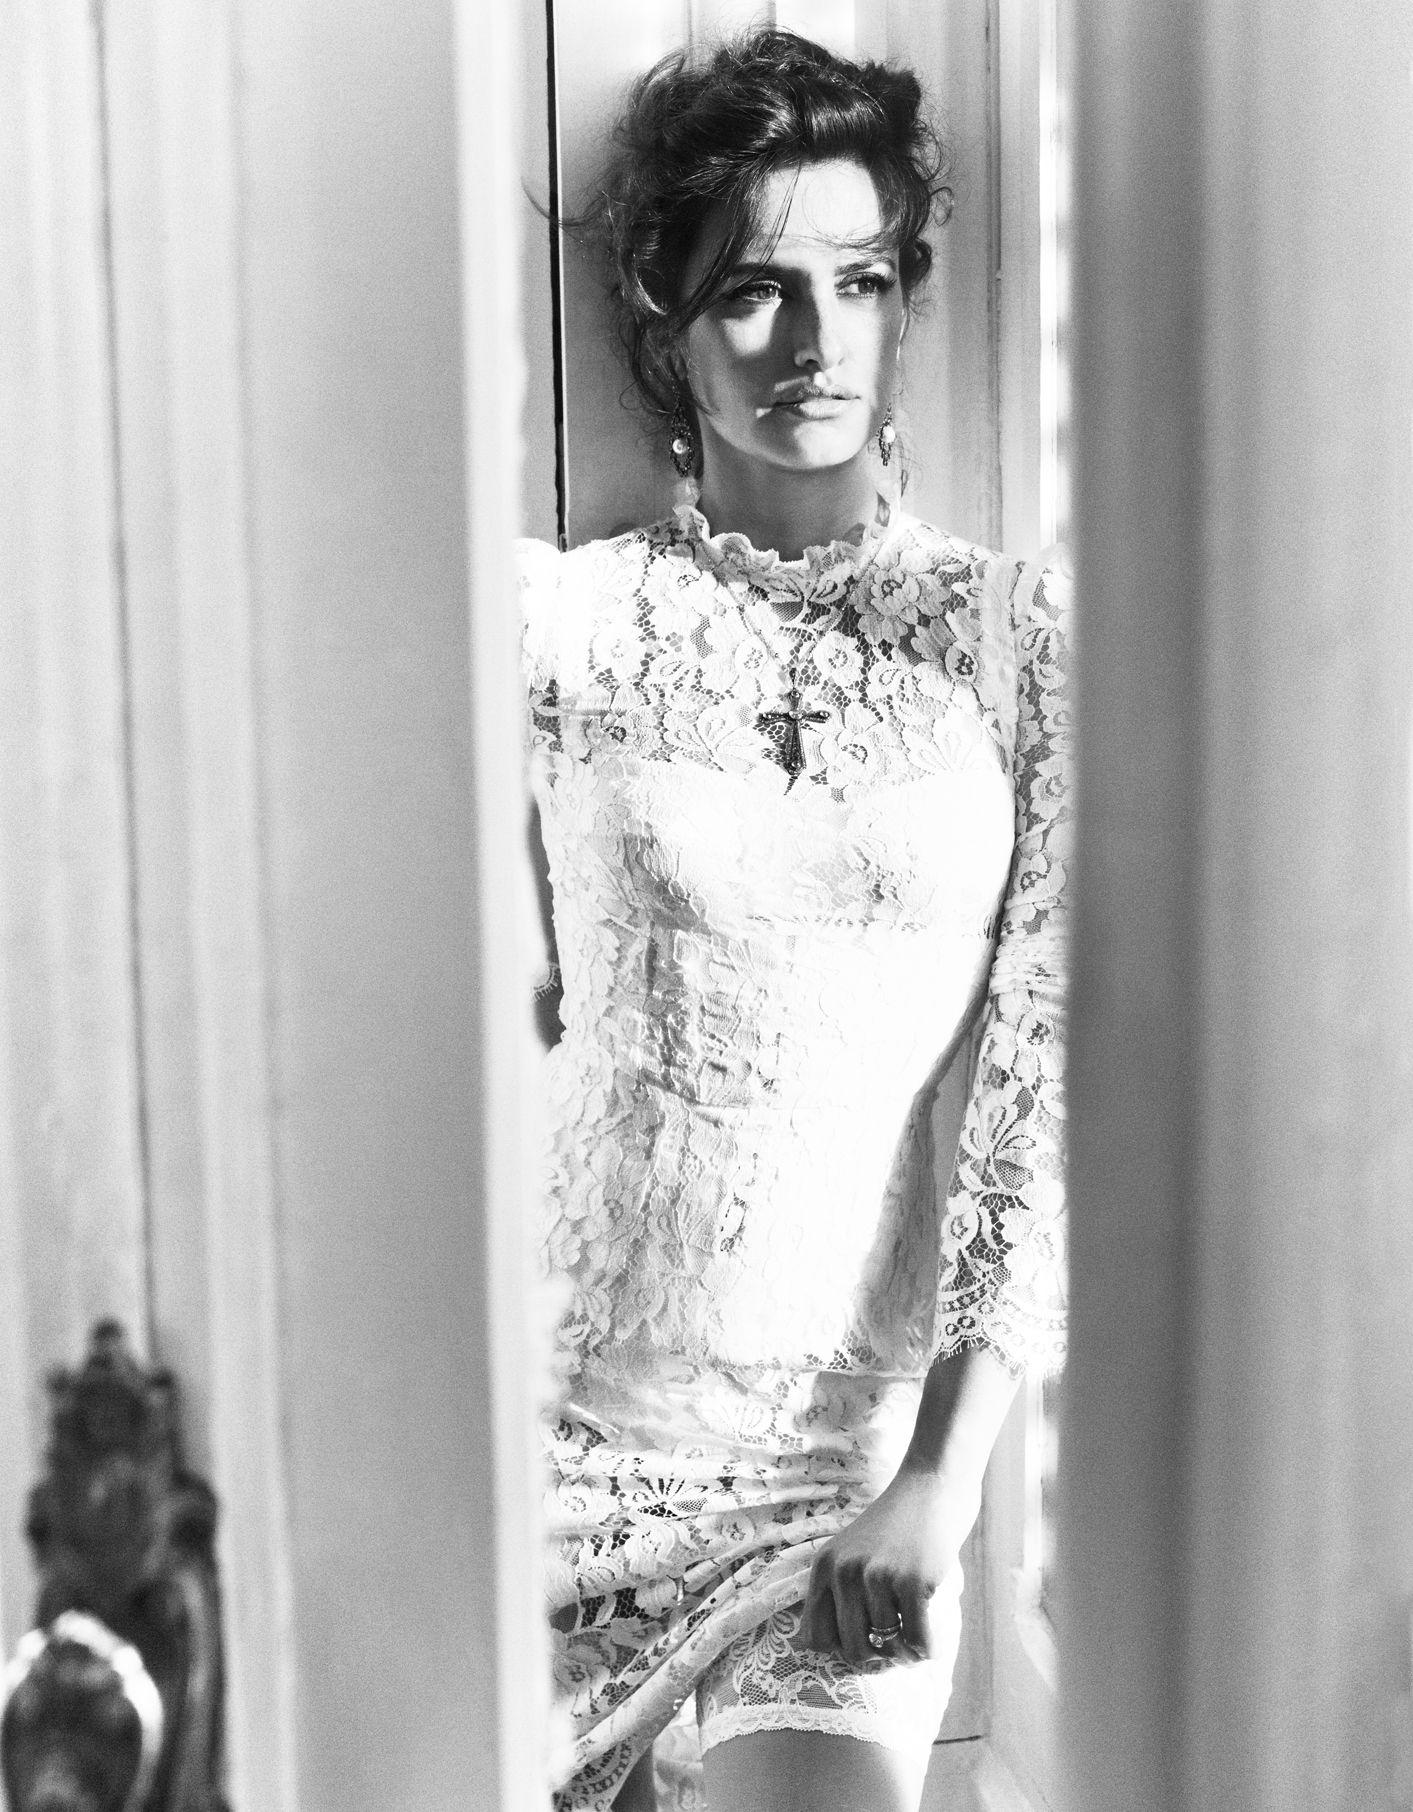 Penelope Cruz - November 2012 - Sangre Caliente - Vogue Spain - Photo by Tom Munro